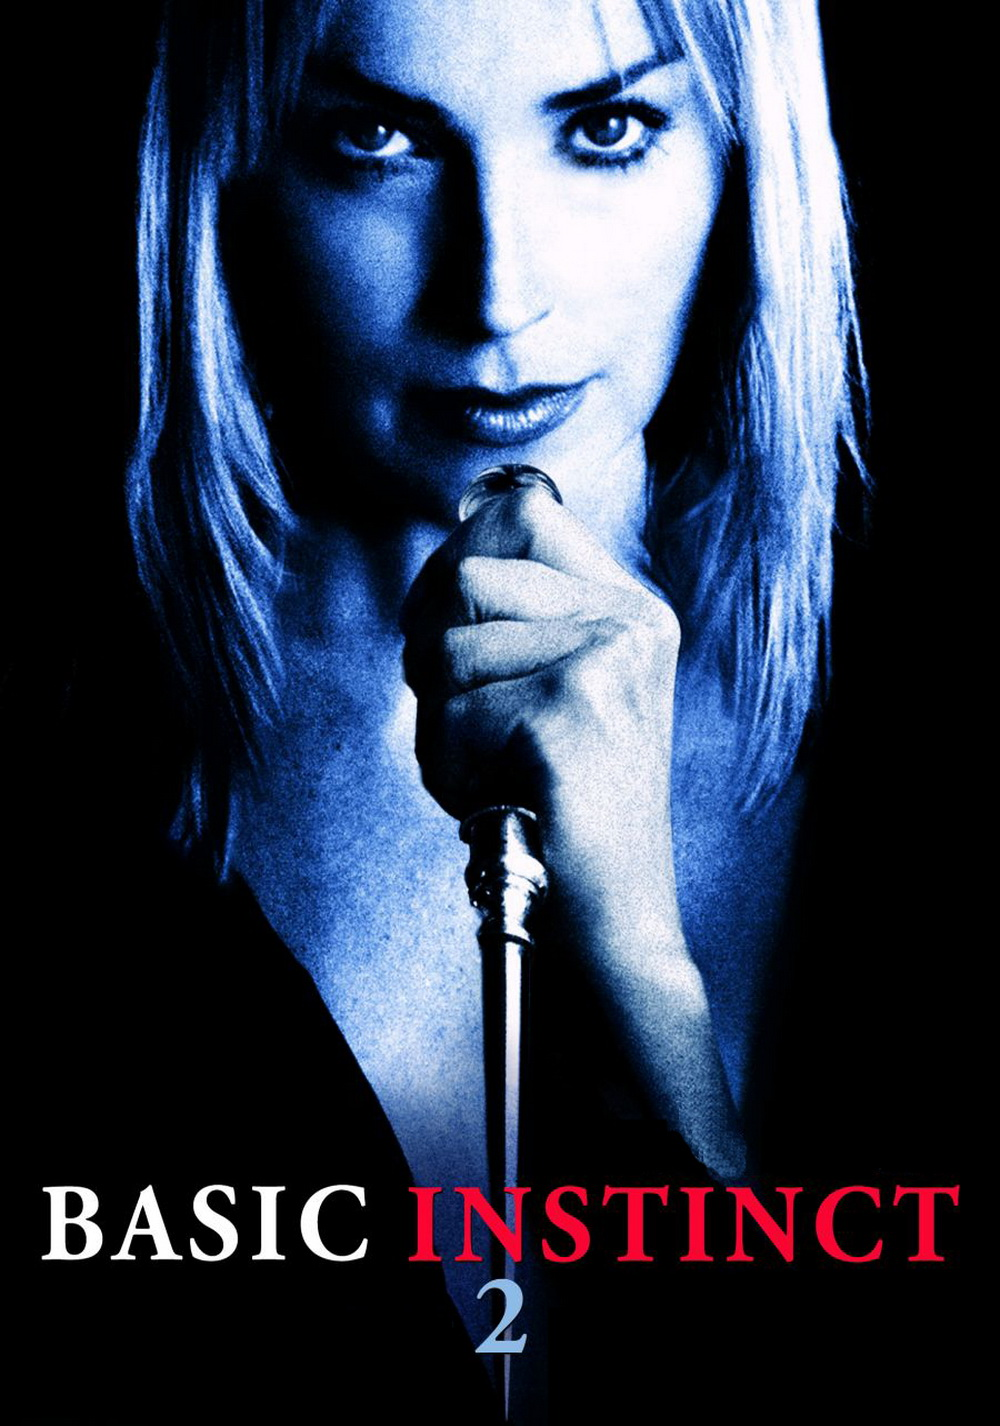 basic instinct 2 movie fanart fanarttv